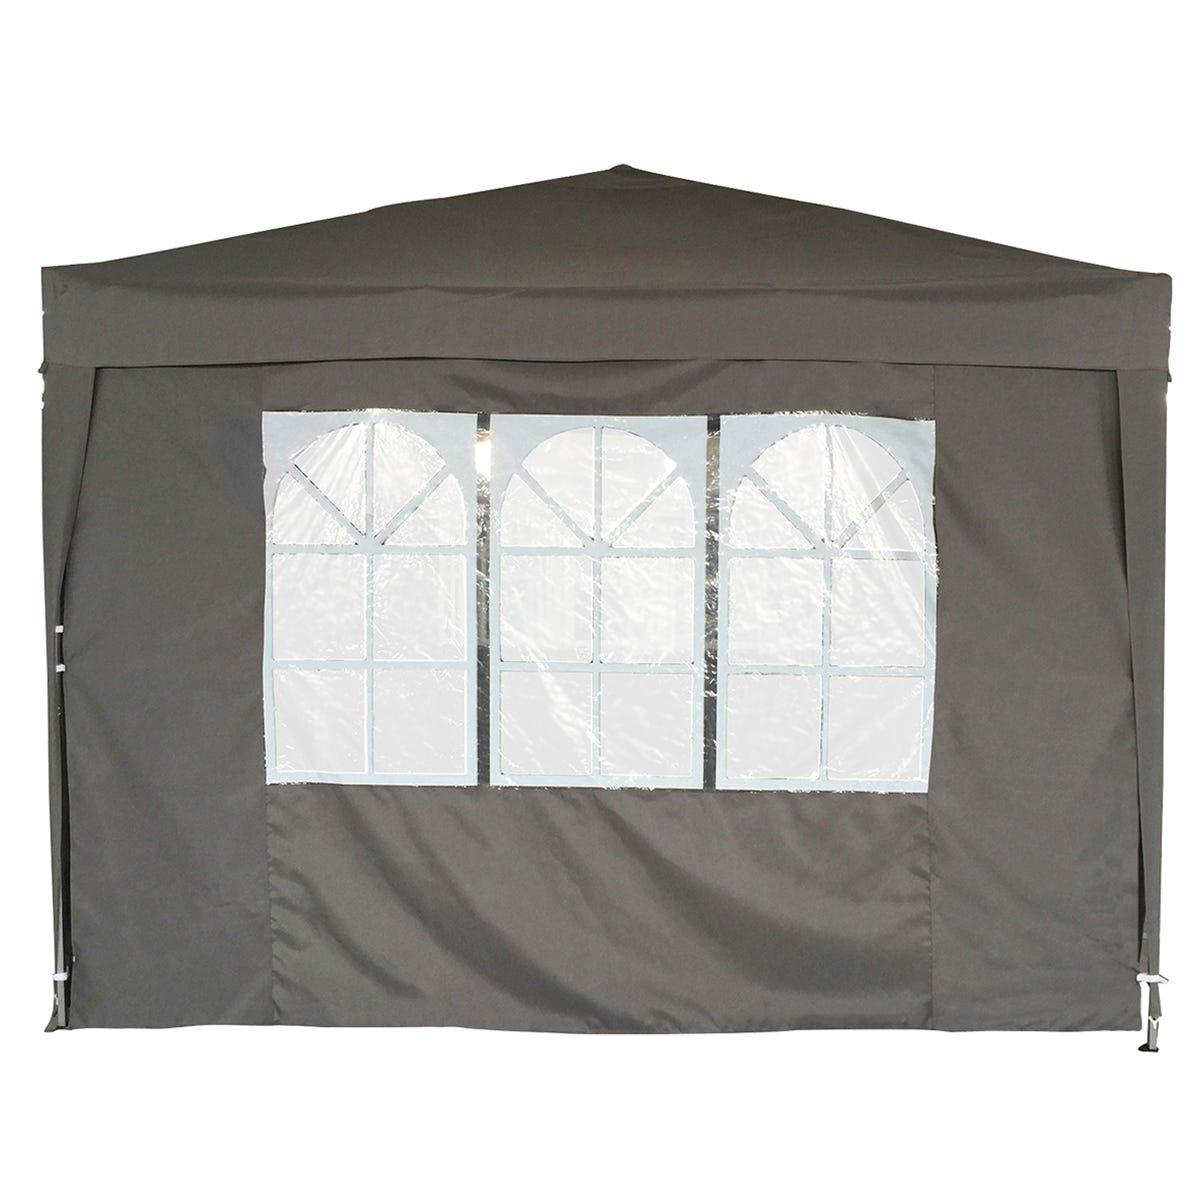 Charles Bentley 3x3m Pop Up Gazebo With 3 Side Walls - Grey